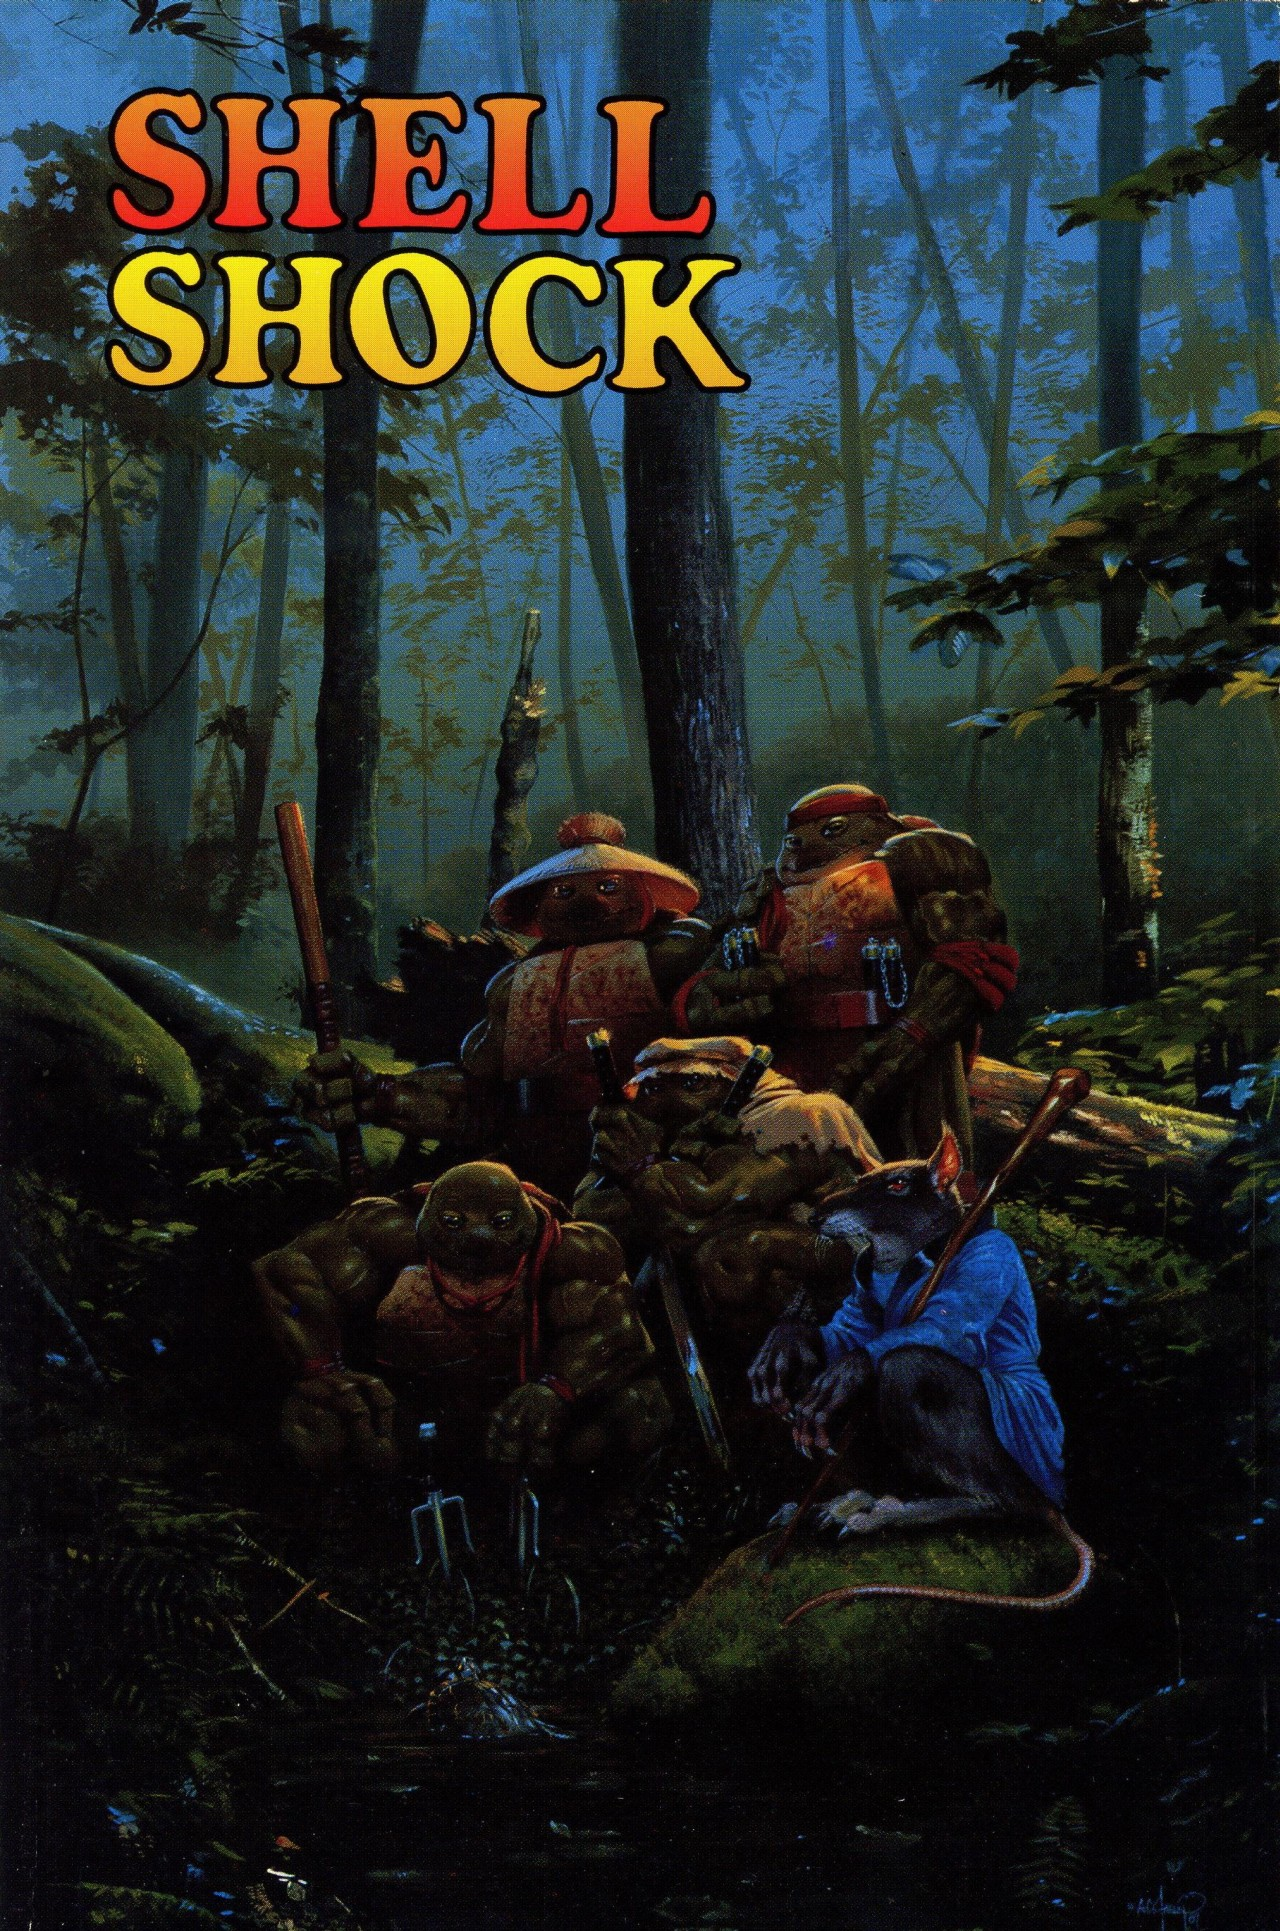 Read online Shell Shock comic -  Issue # Full - 1